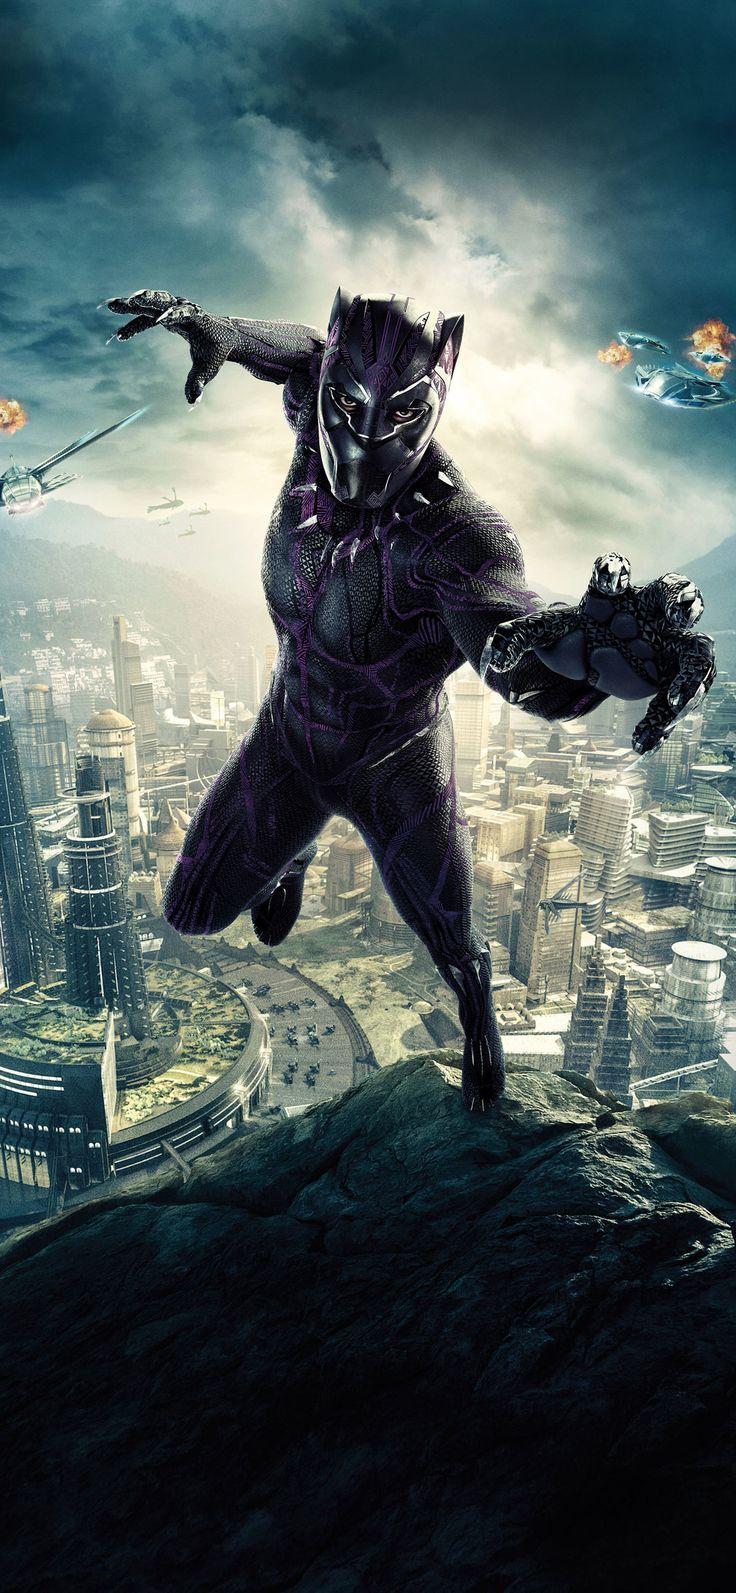 1125x2436 Black Panther 10k Poster Iphone XS,Iphone 10